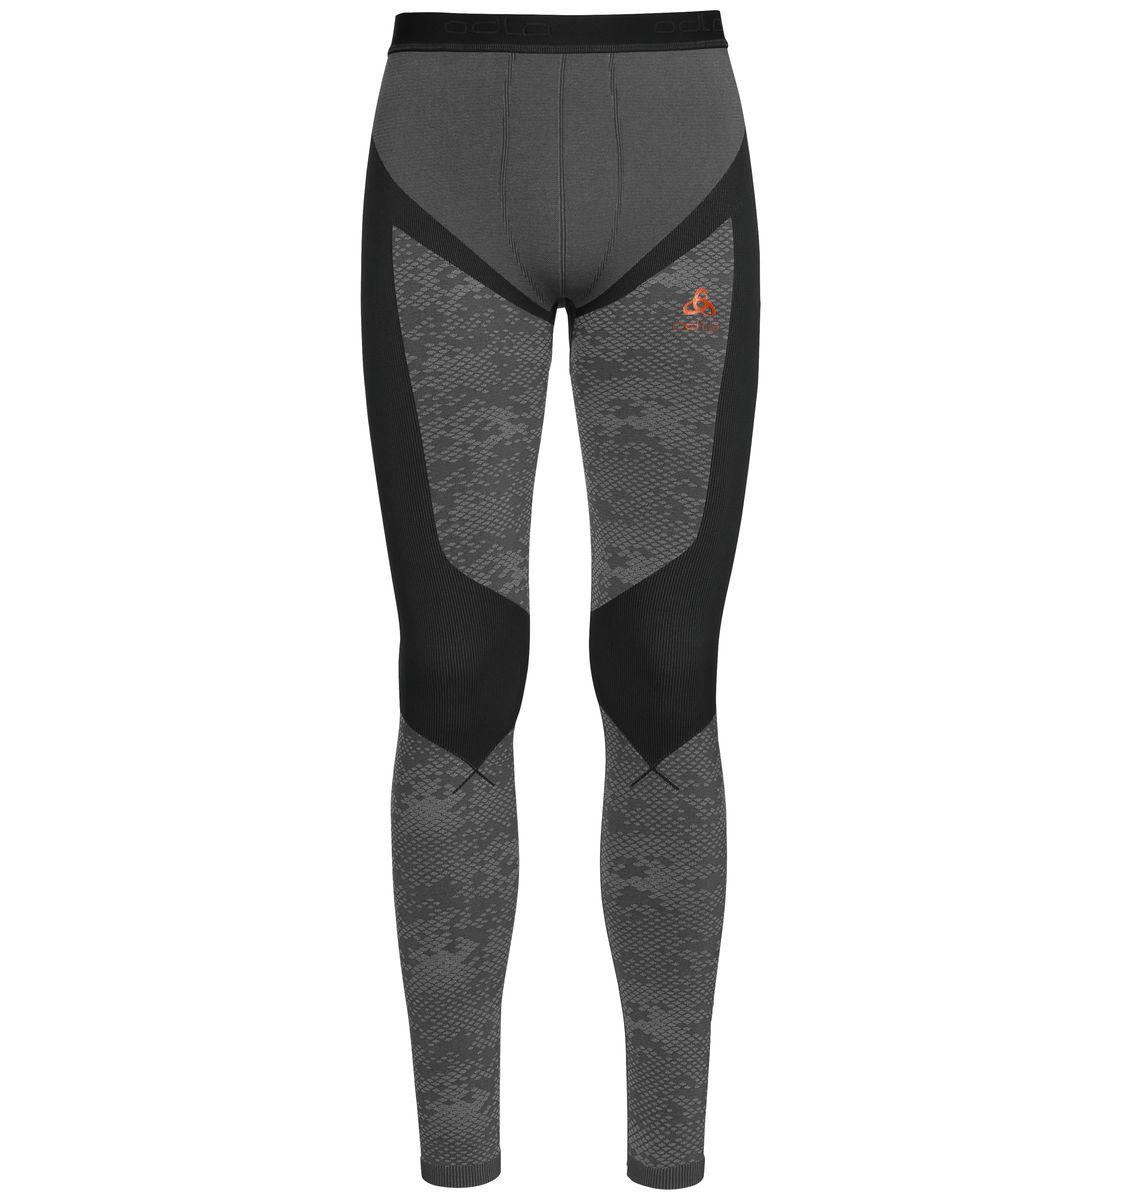 Odlo - Blackcomb Evolution Warm - Running pants - Men's